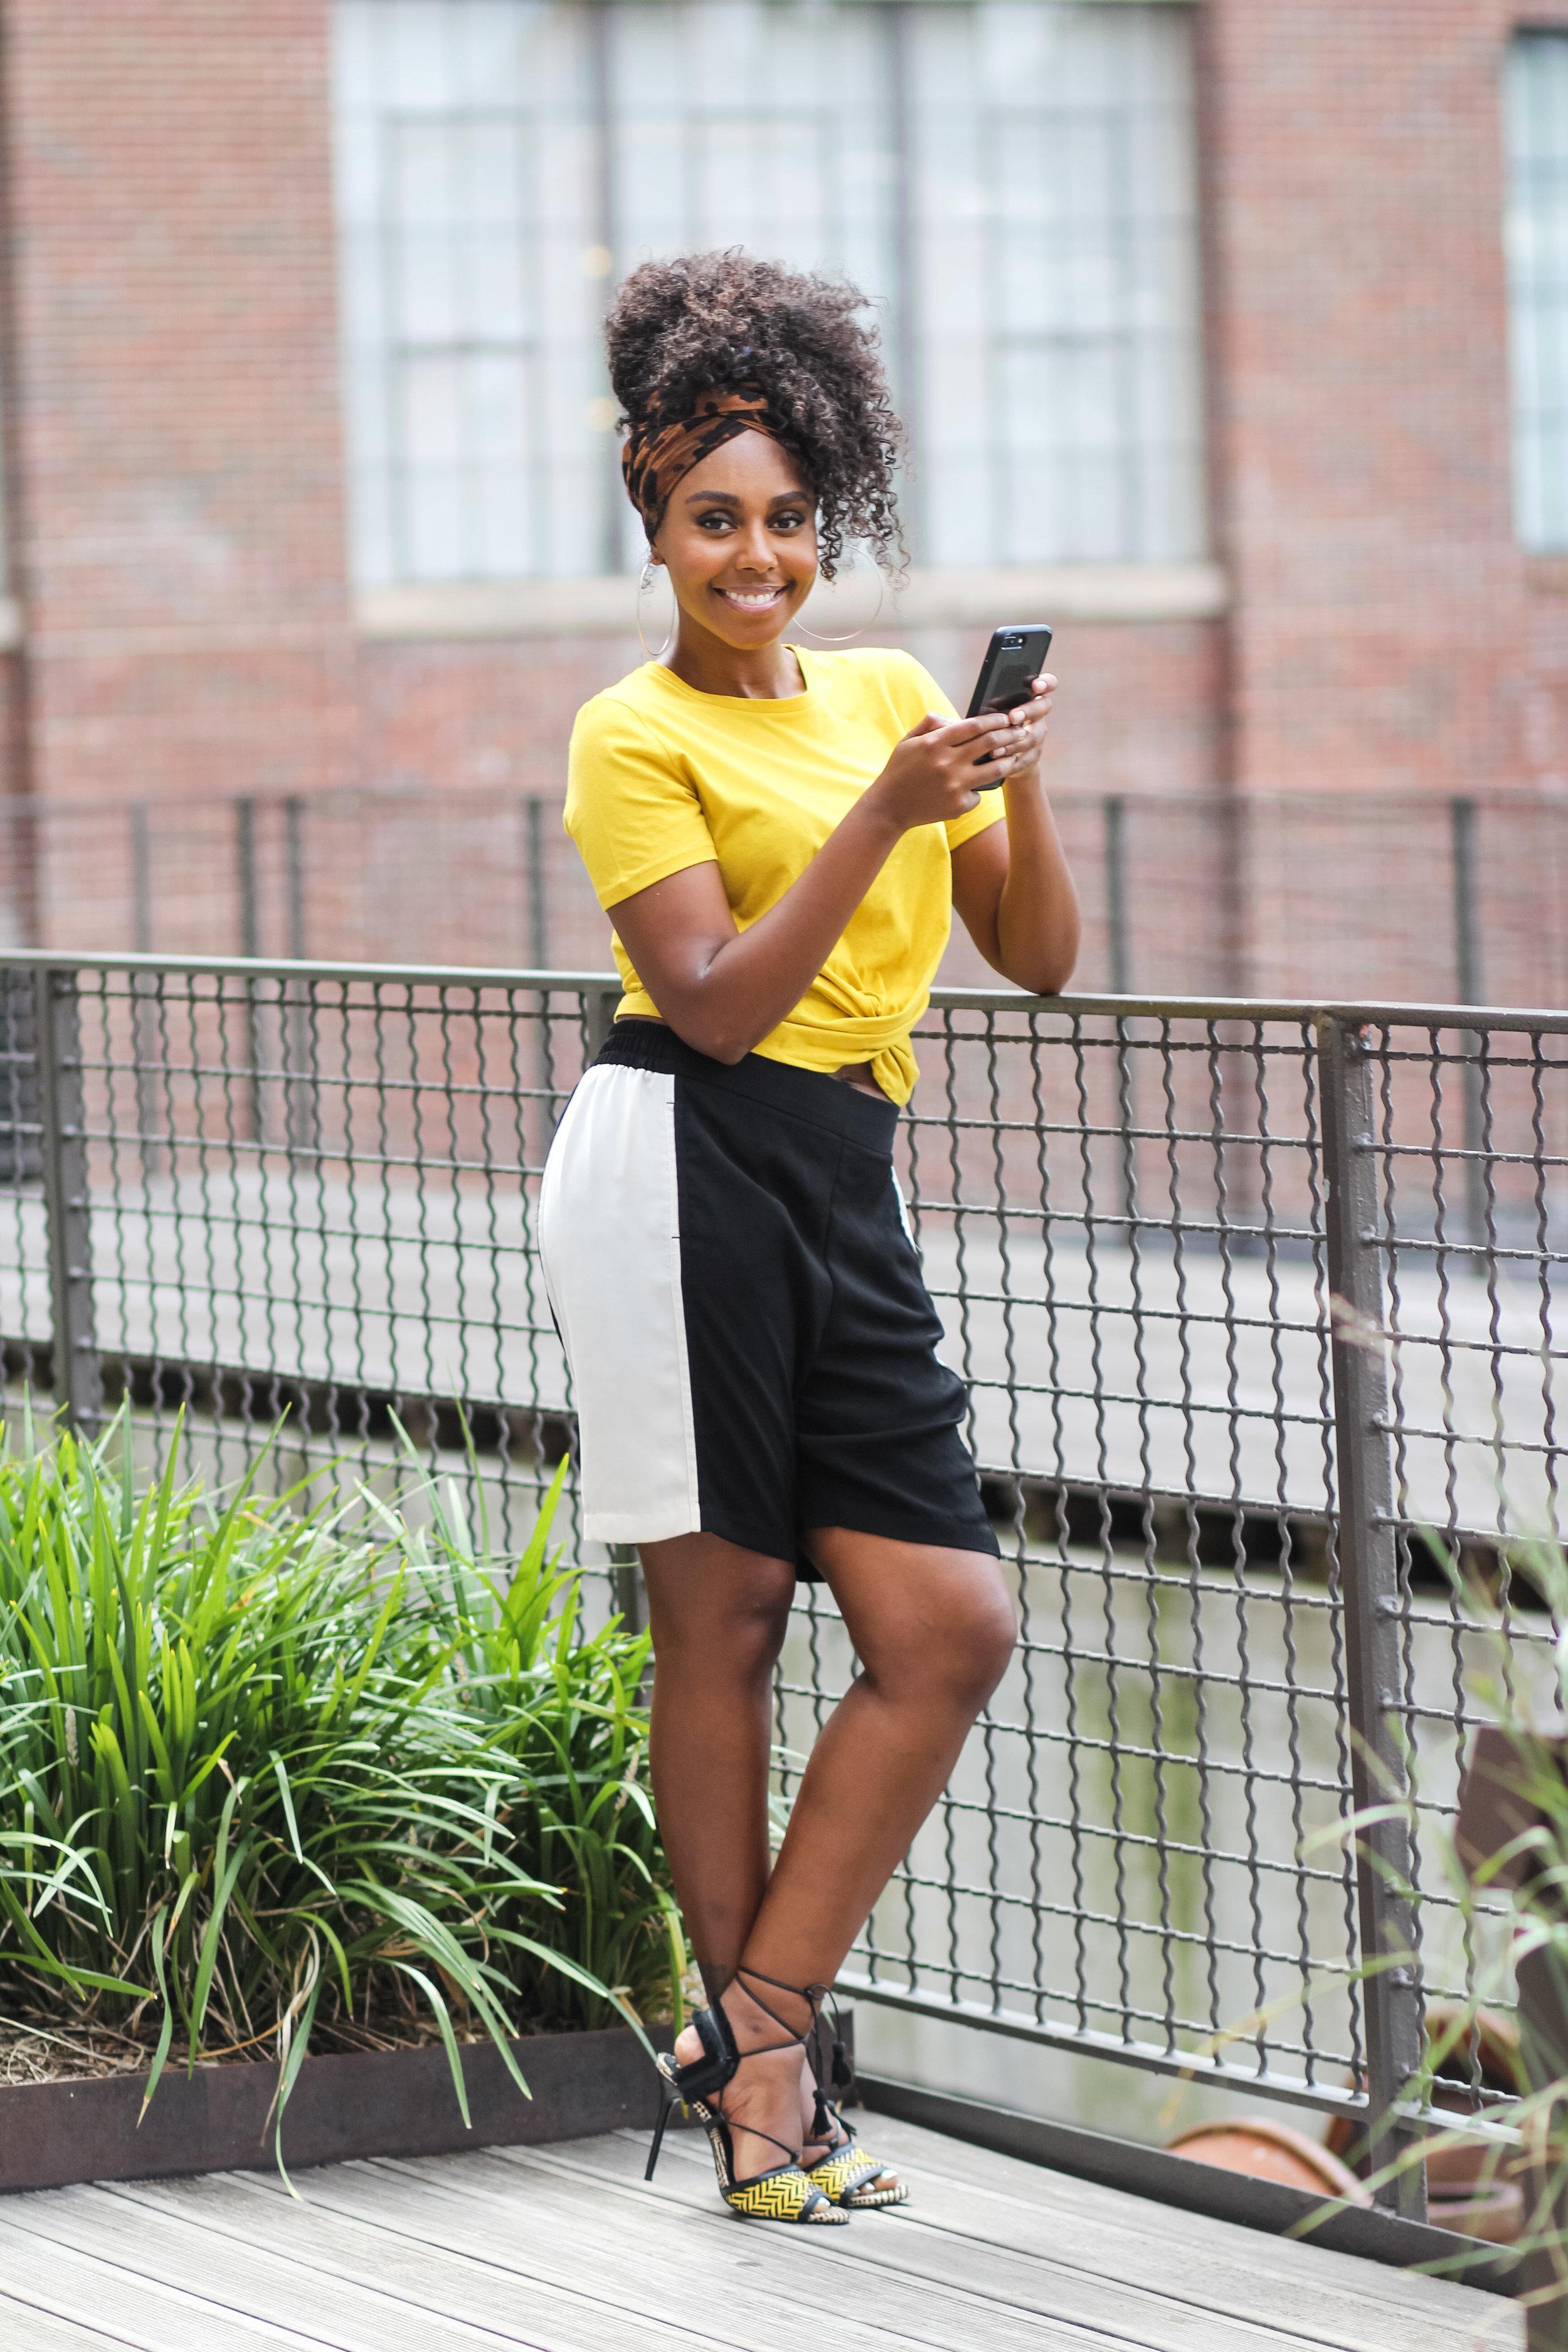 Ariane Turner, Holistic Beauty Advocate